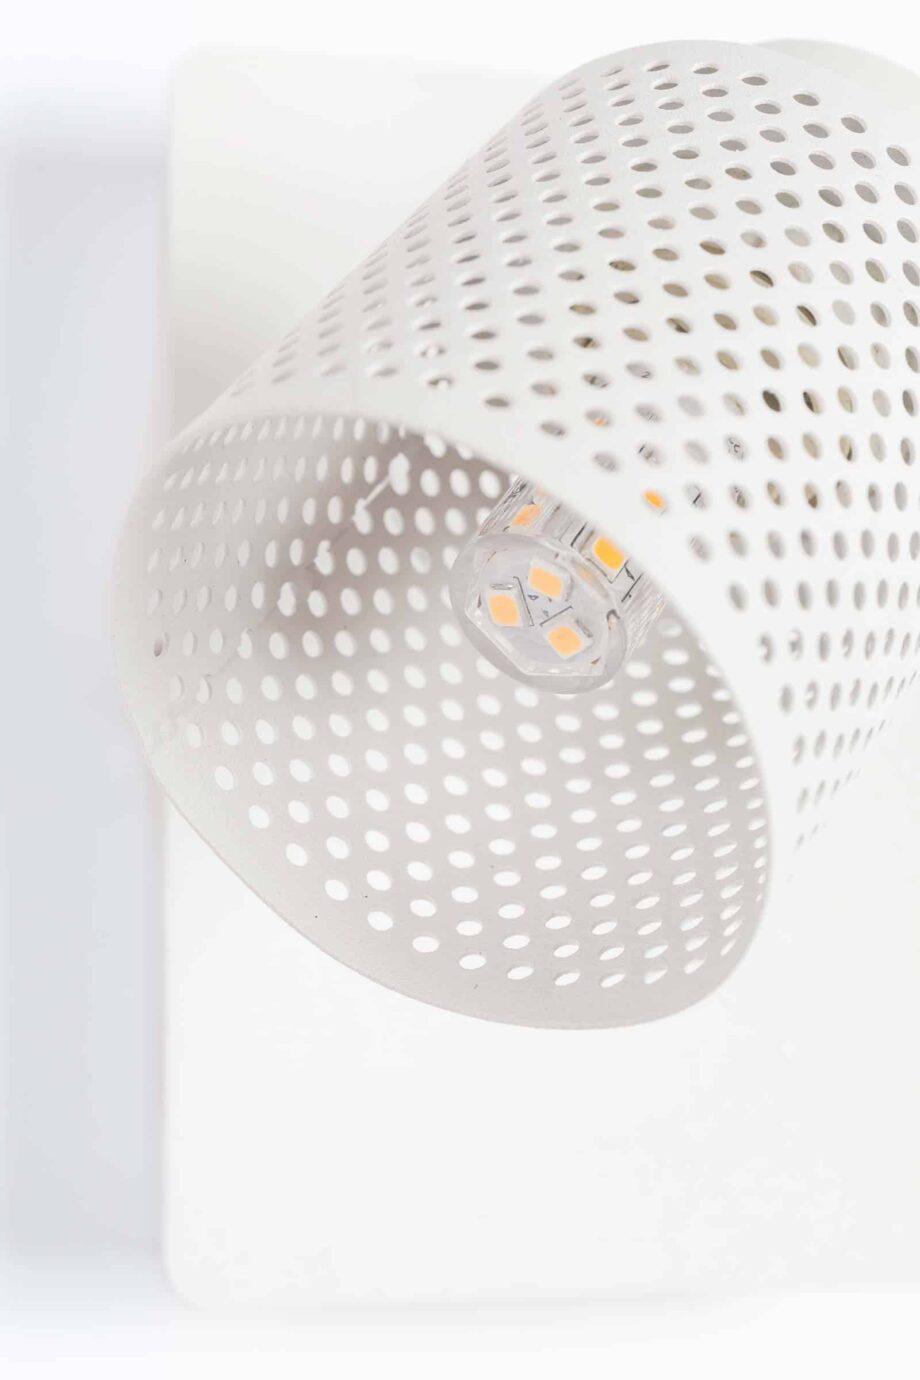 Sandy spotlamp wit Designshopp 3